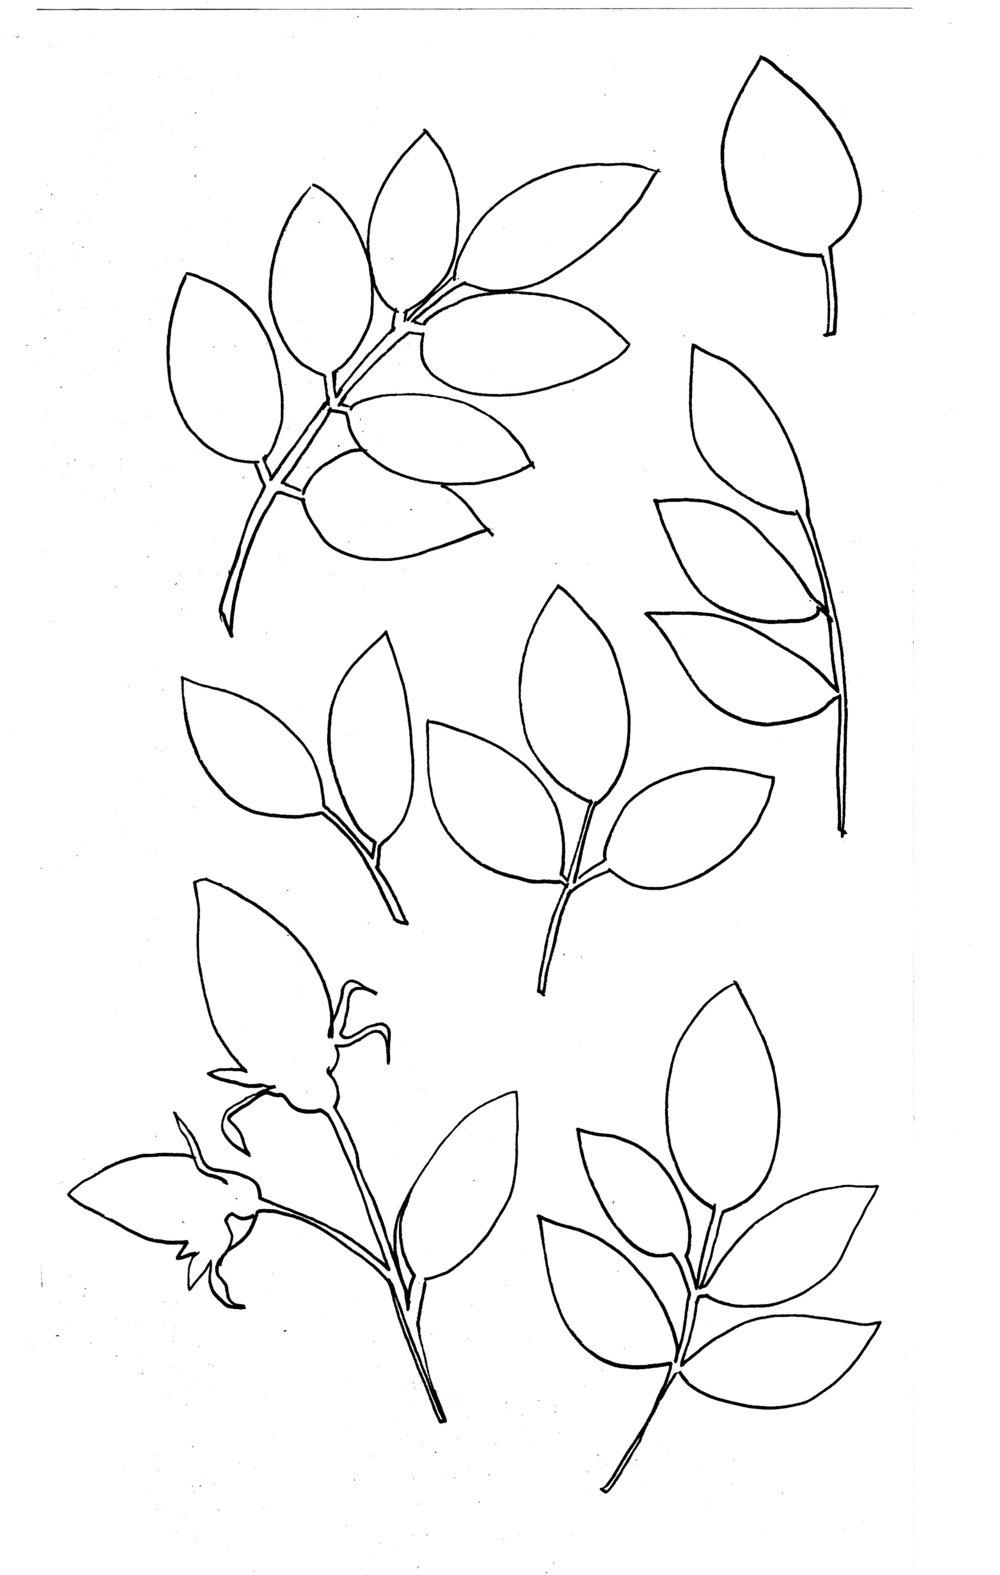 Roses3.jpeg